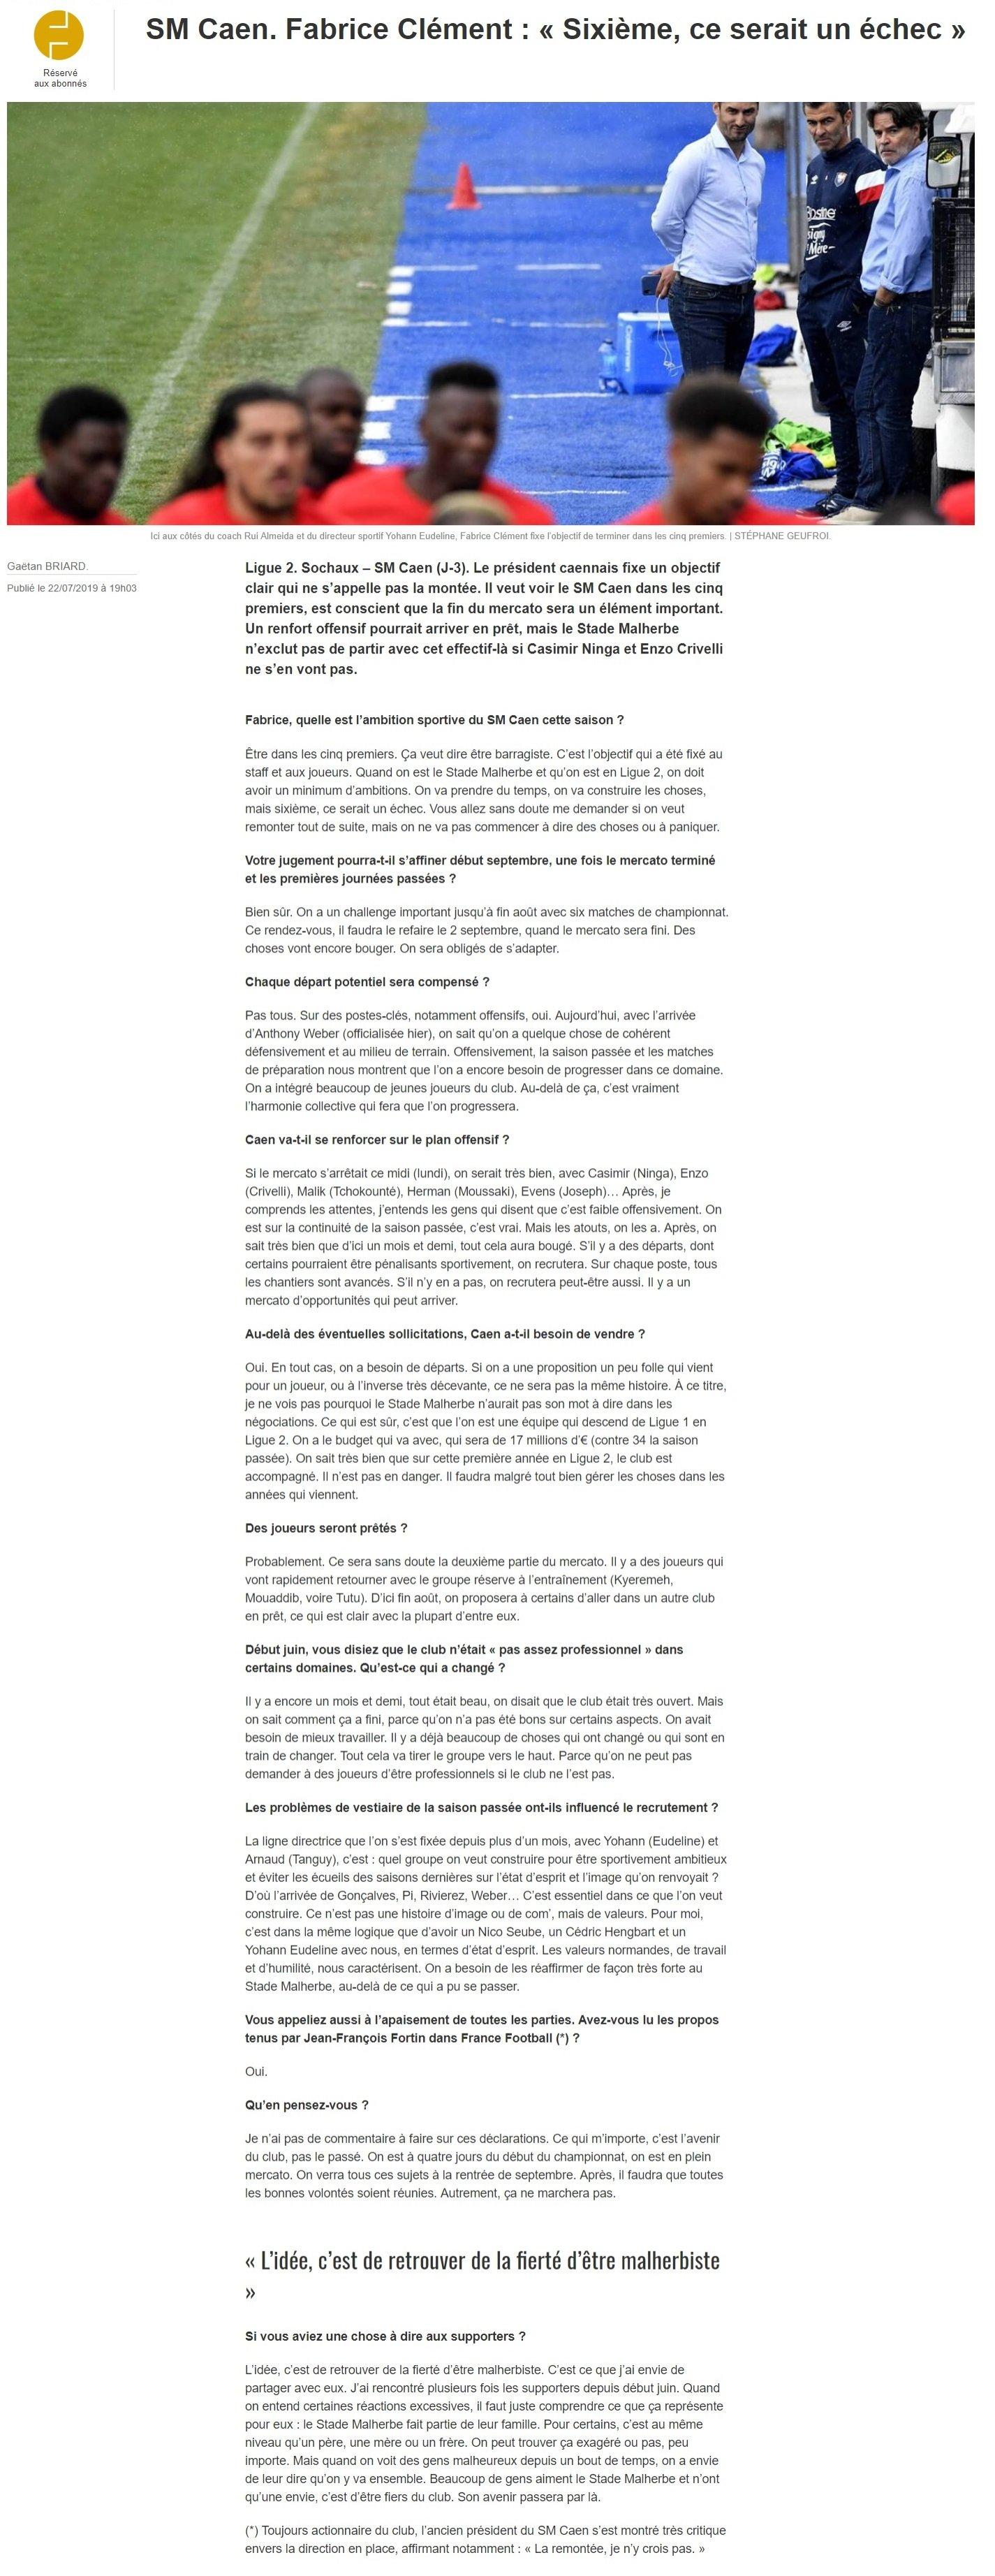 [2019/2020]Revue de presse - Page 3 190722073849741594